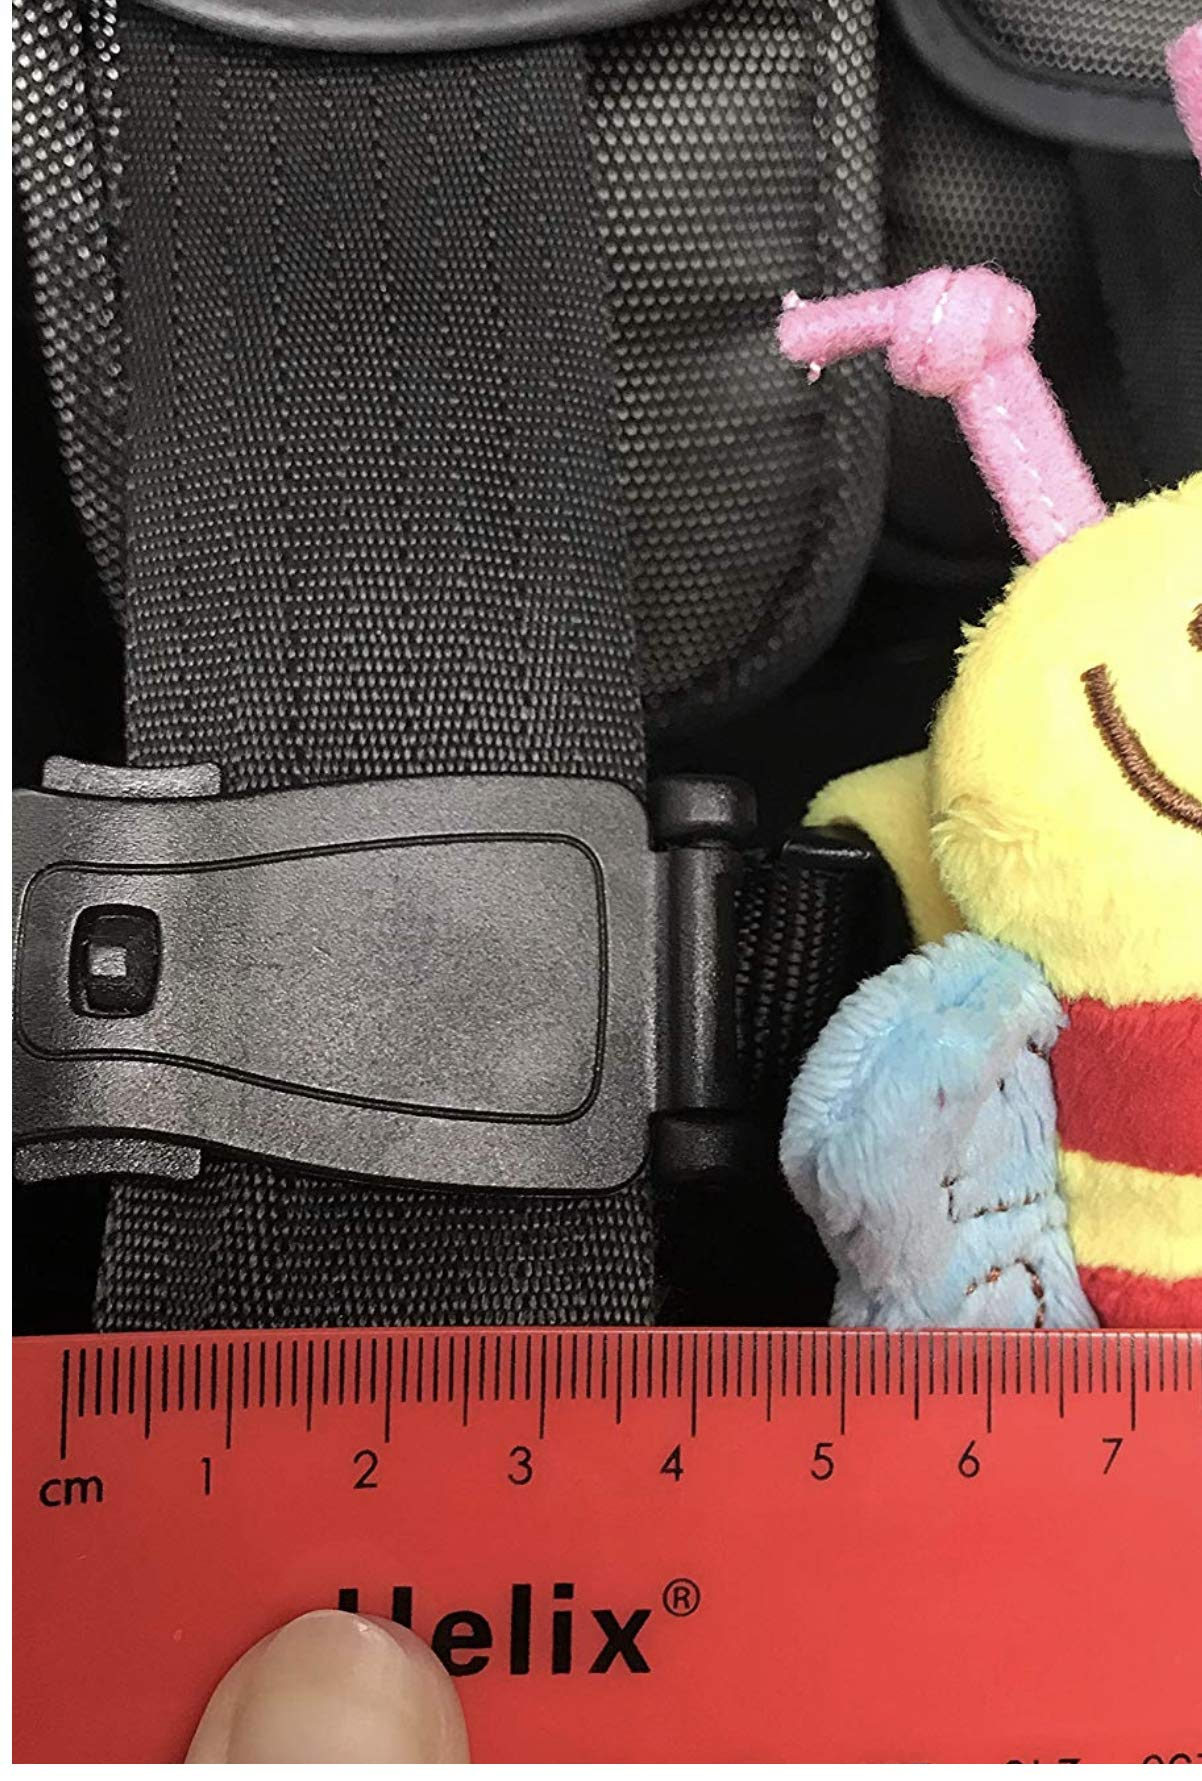 CAR SEAT ANTI ESCAPE CHEST CLIP HARNESS STRAP TO STOP CHILDREN REMOVING ARMS